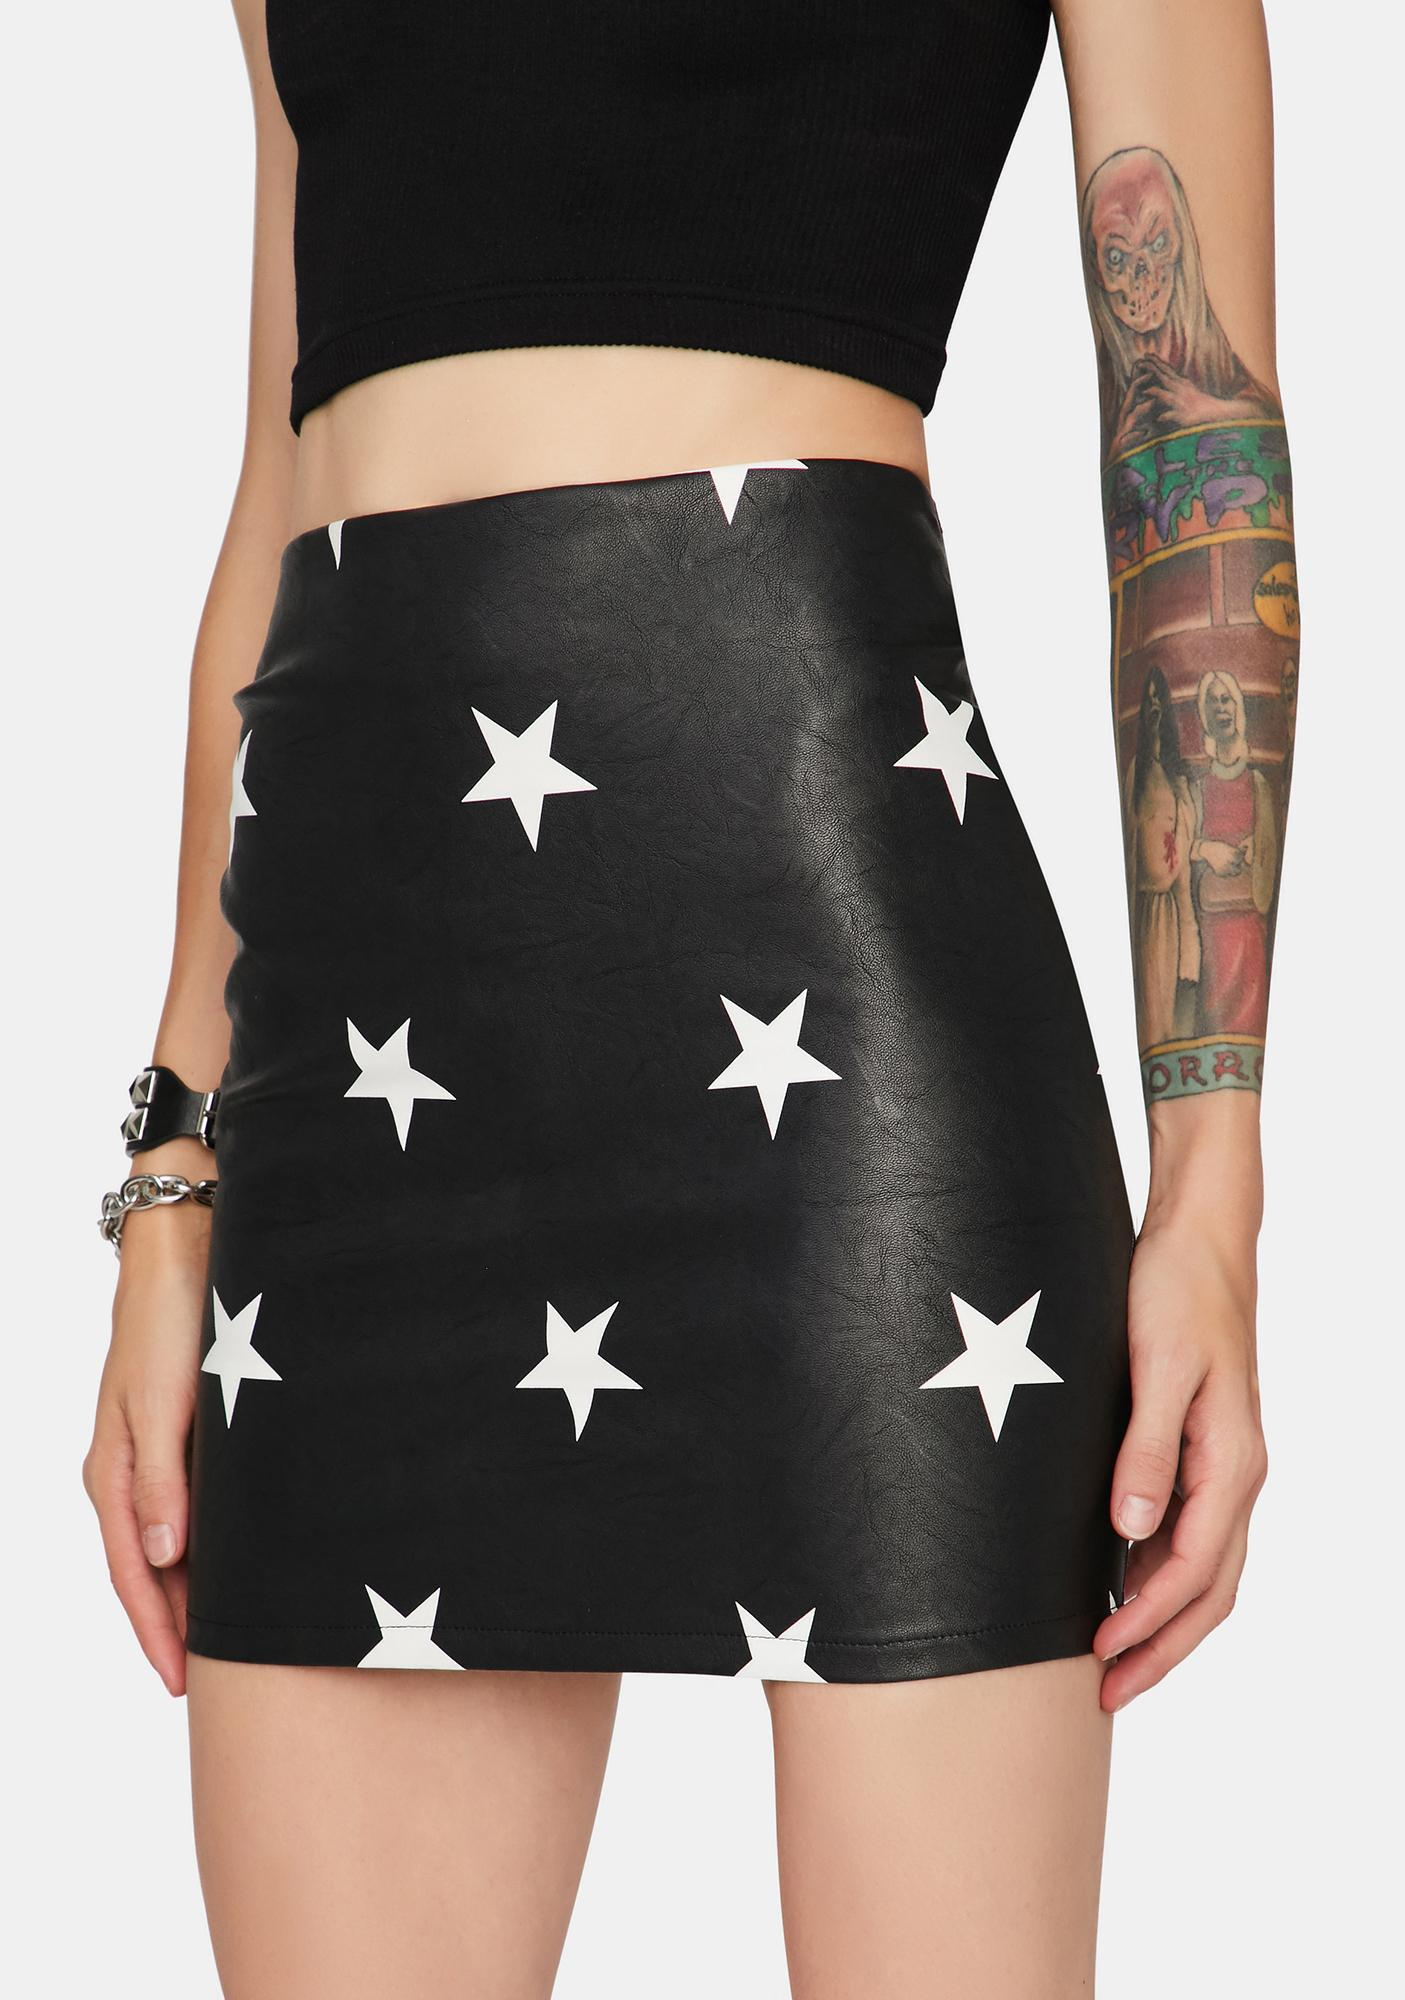 Starry Eyed Surprise Mini Skirt